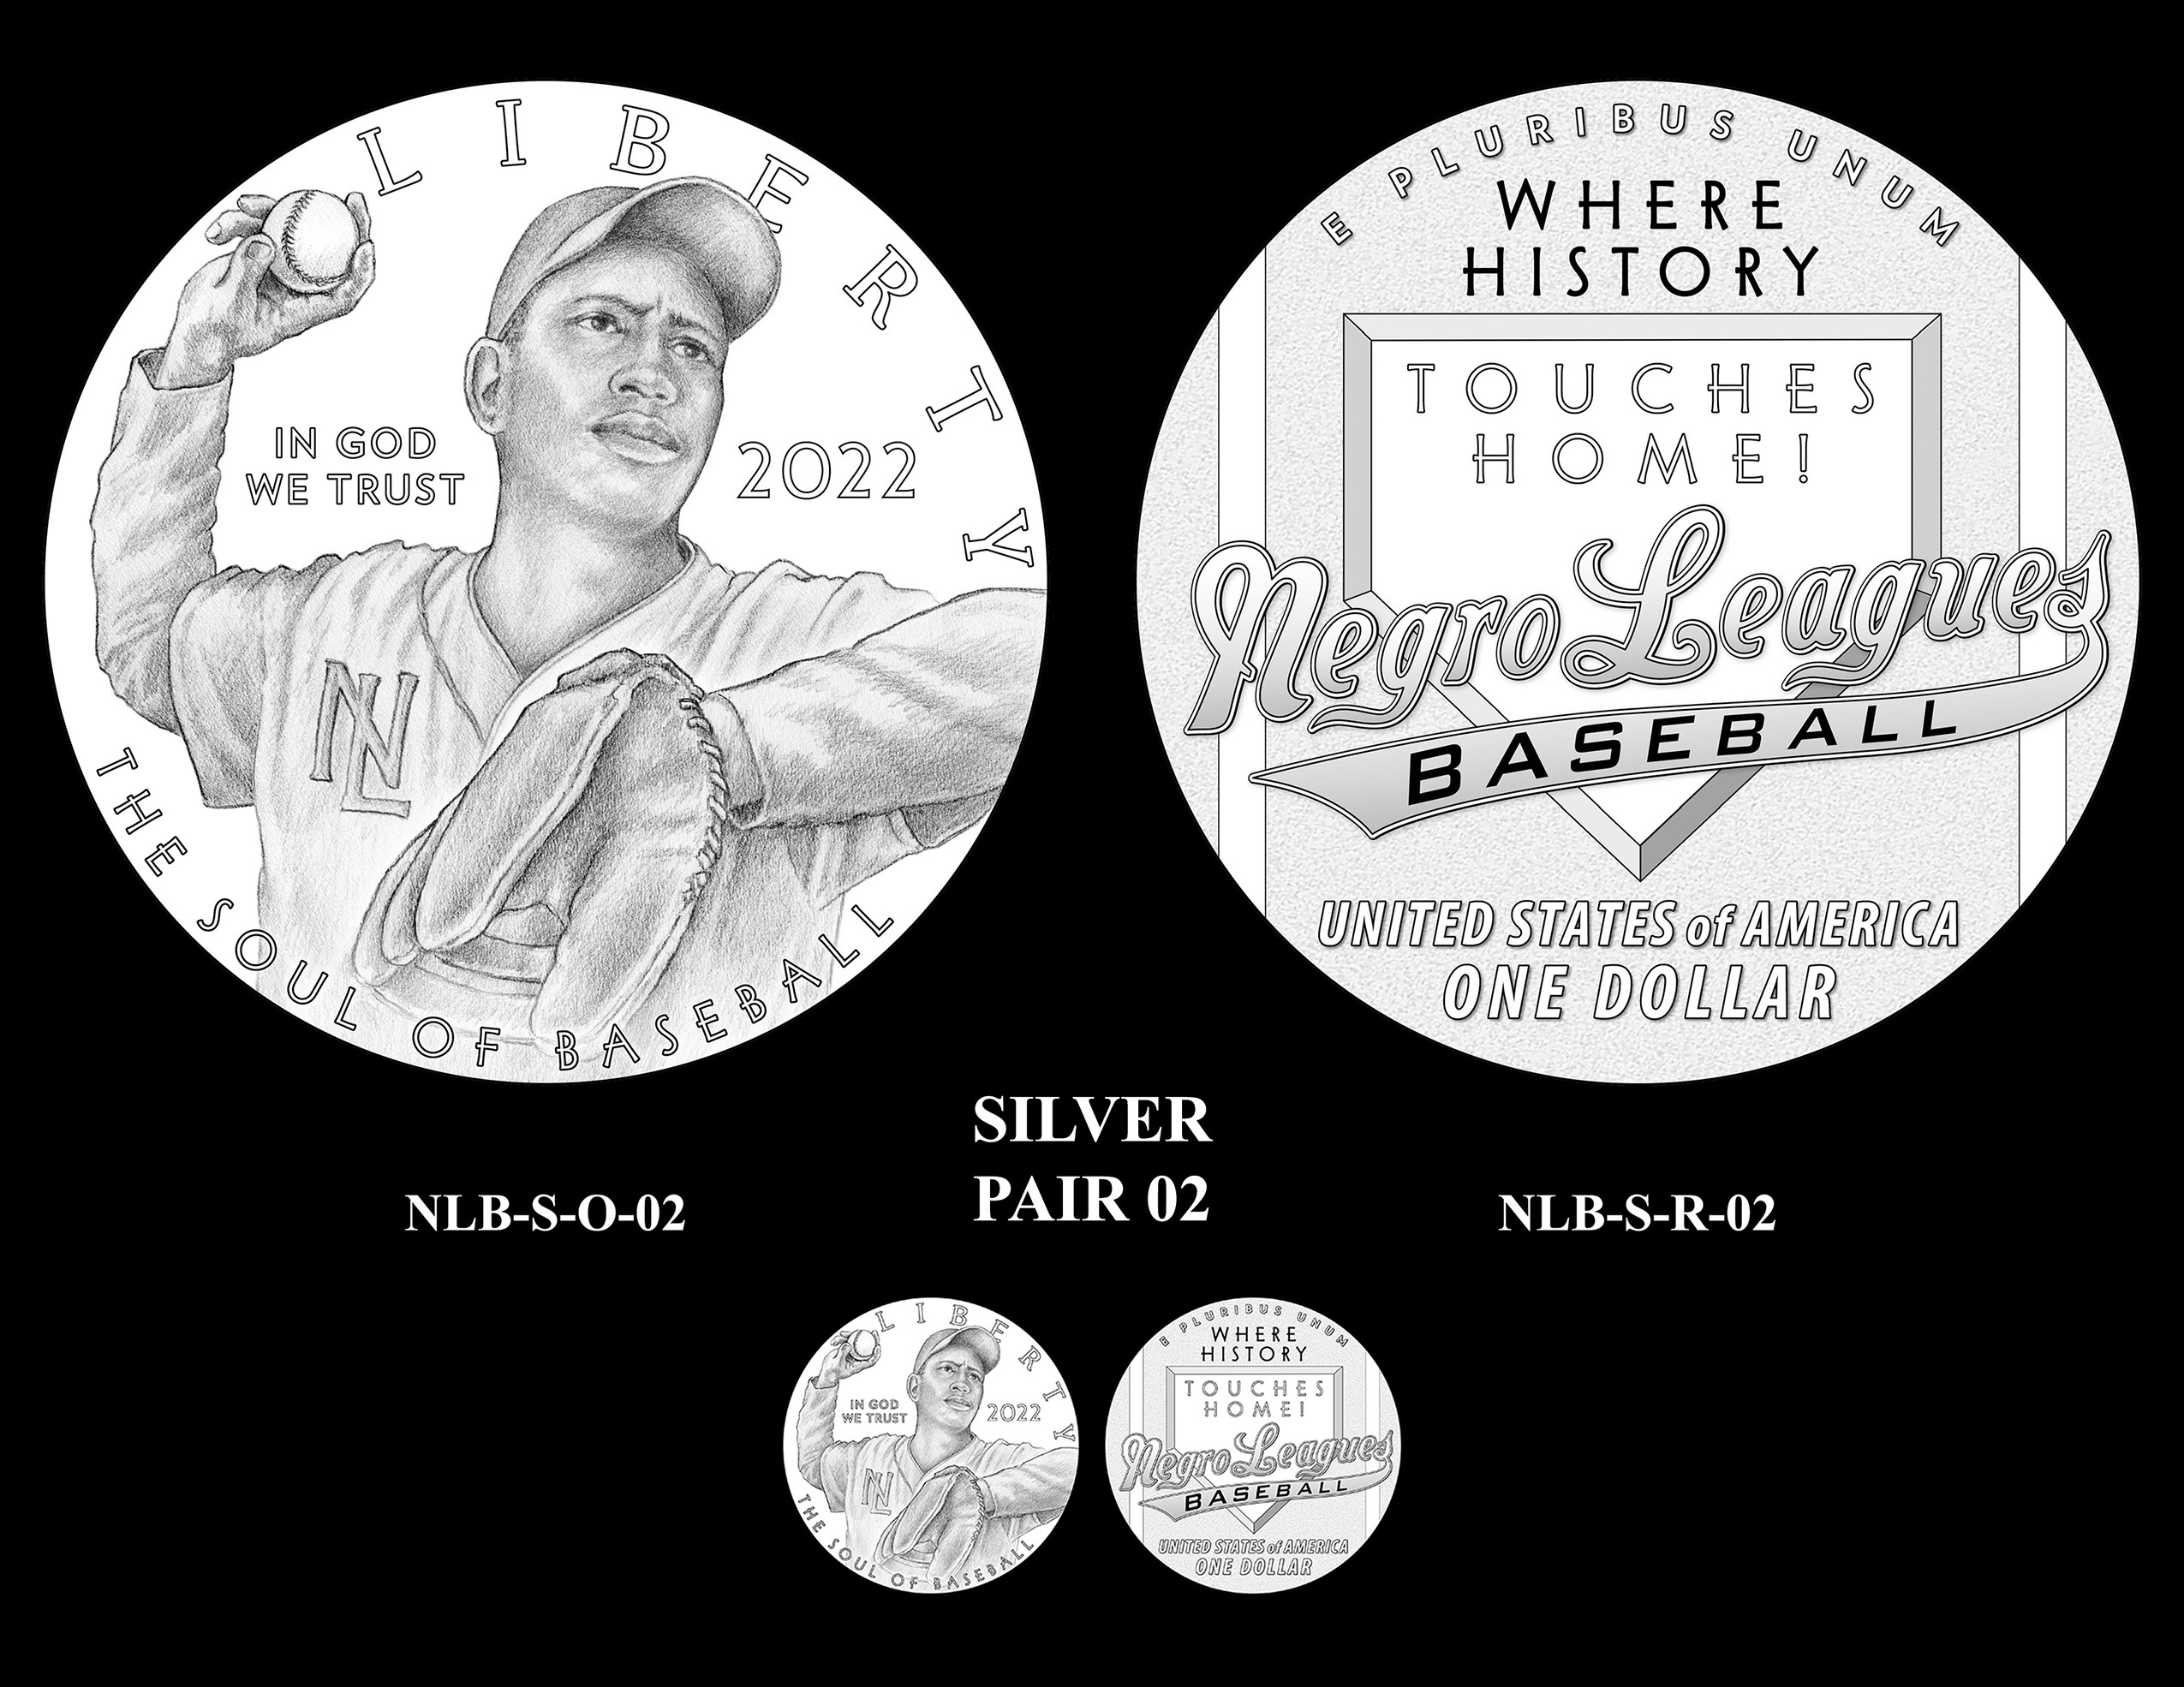 Silver Pair 02 -- Negro Leagues Baseball Commemorative Coin Program